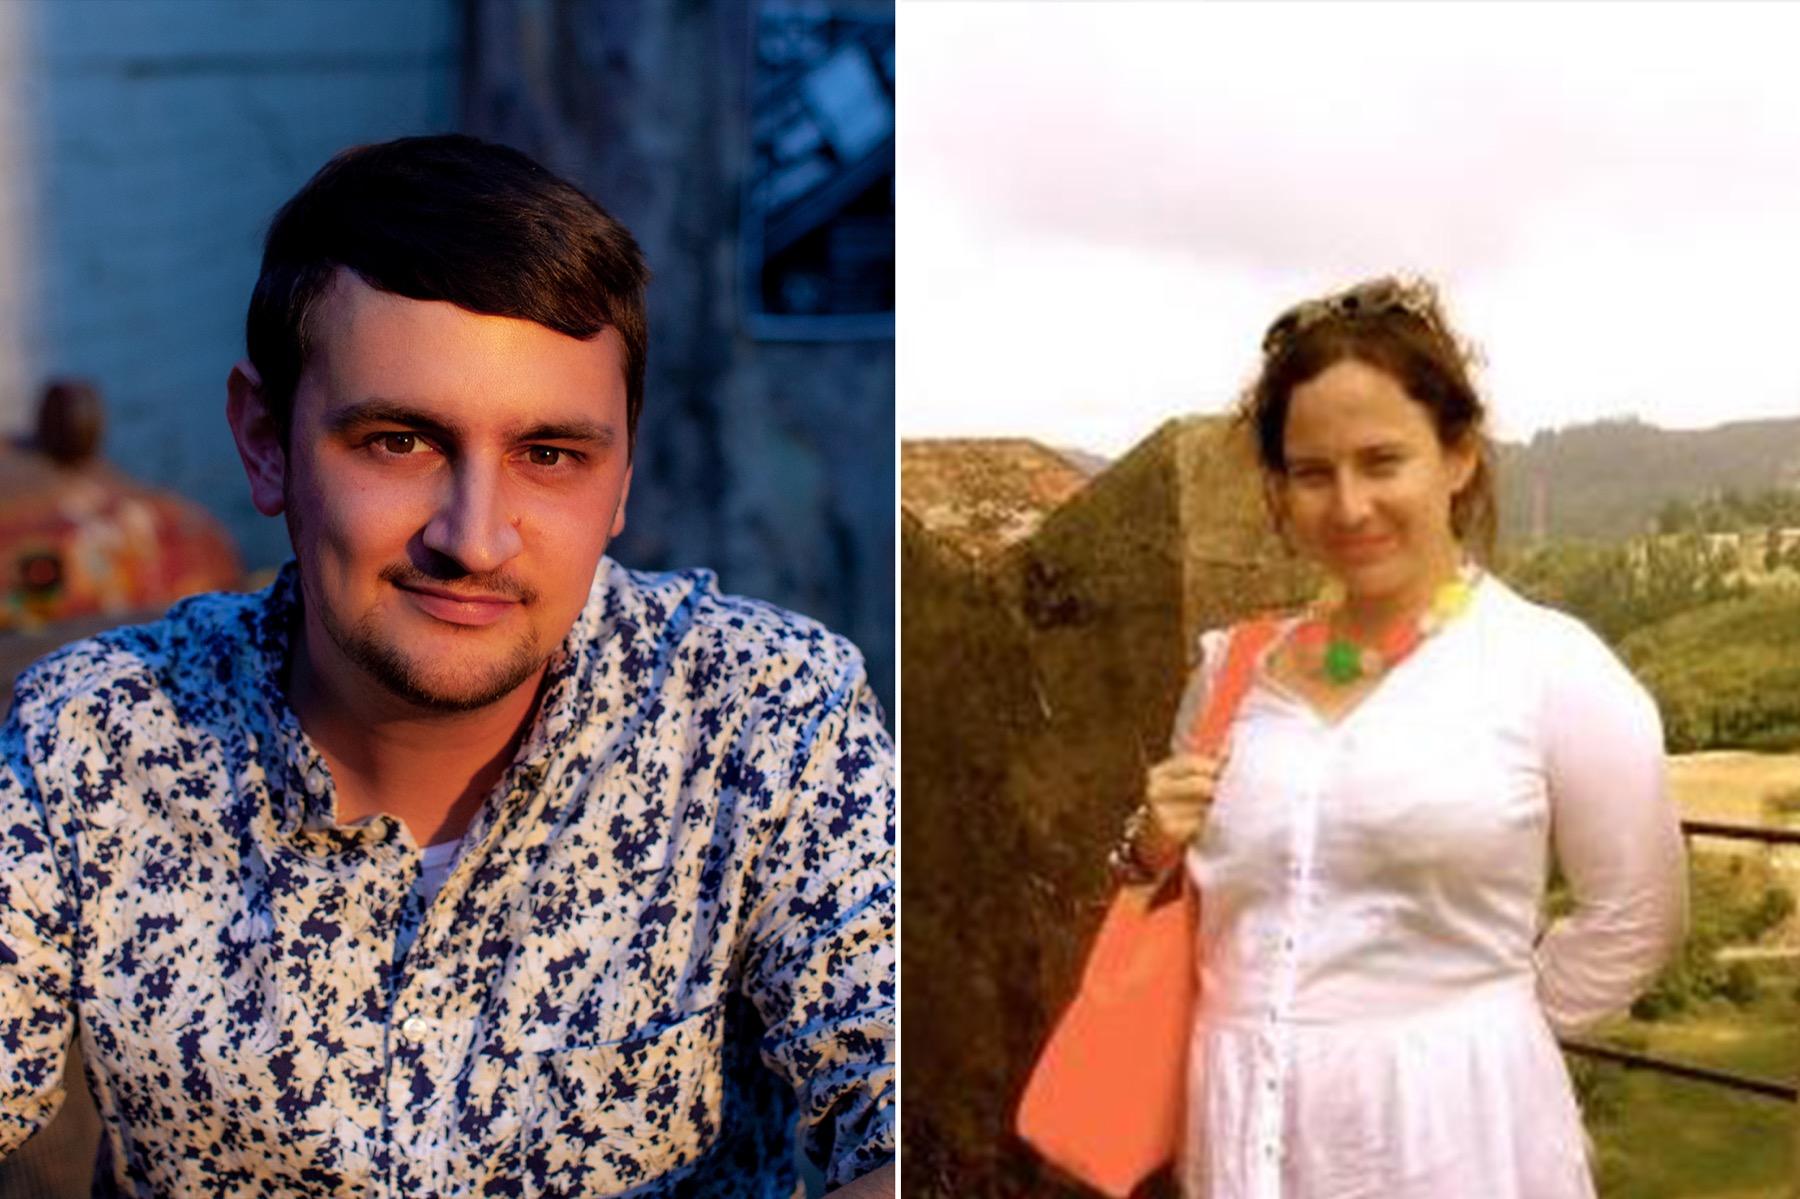 Poetry off the Shelf: John James & Dorothea Lasky